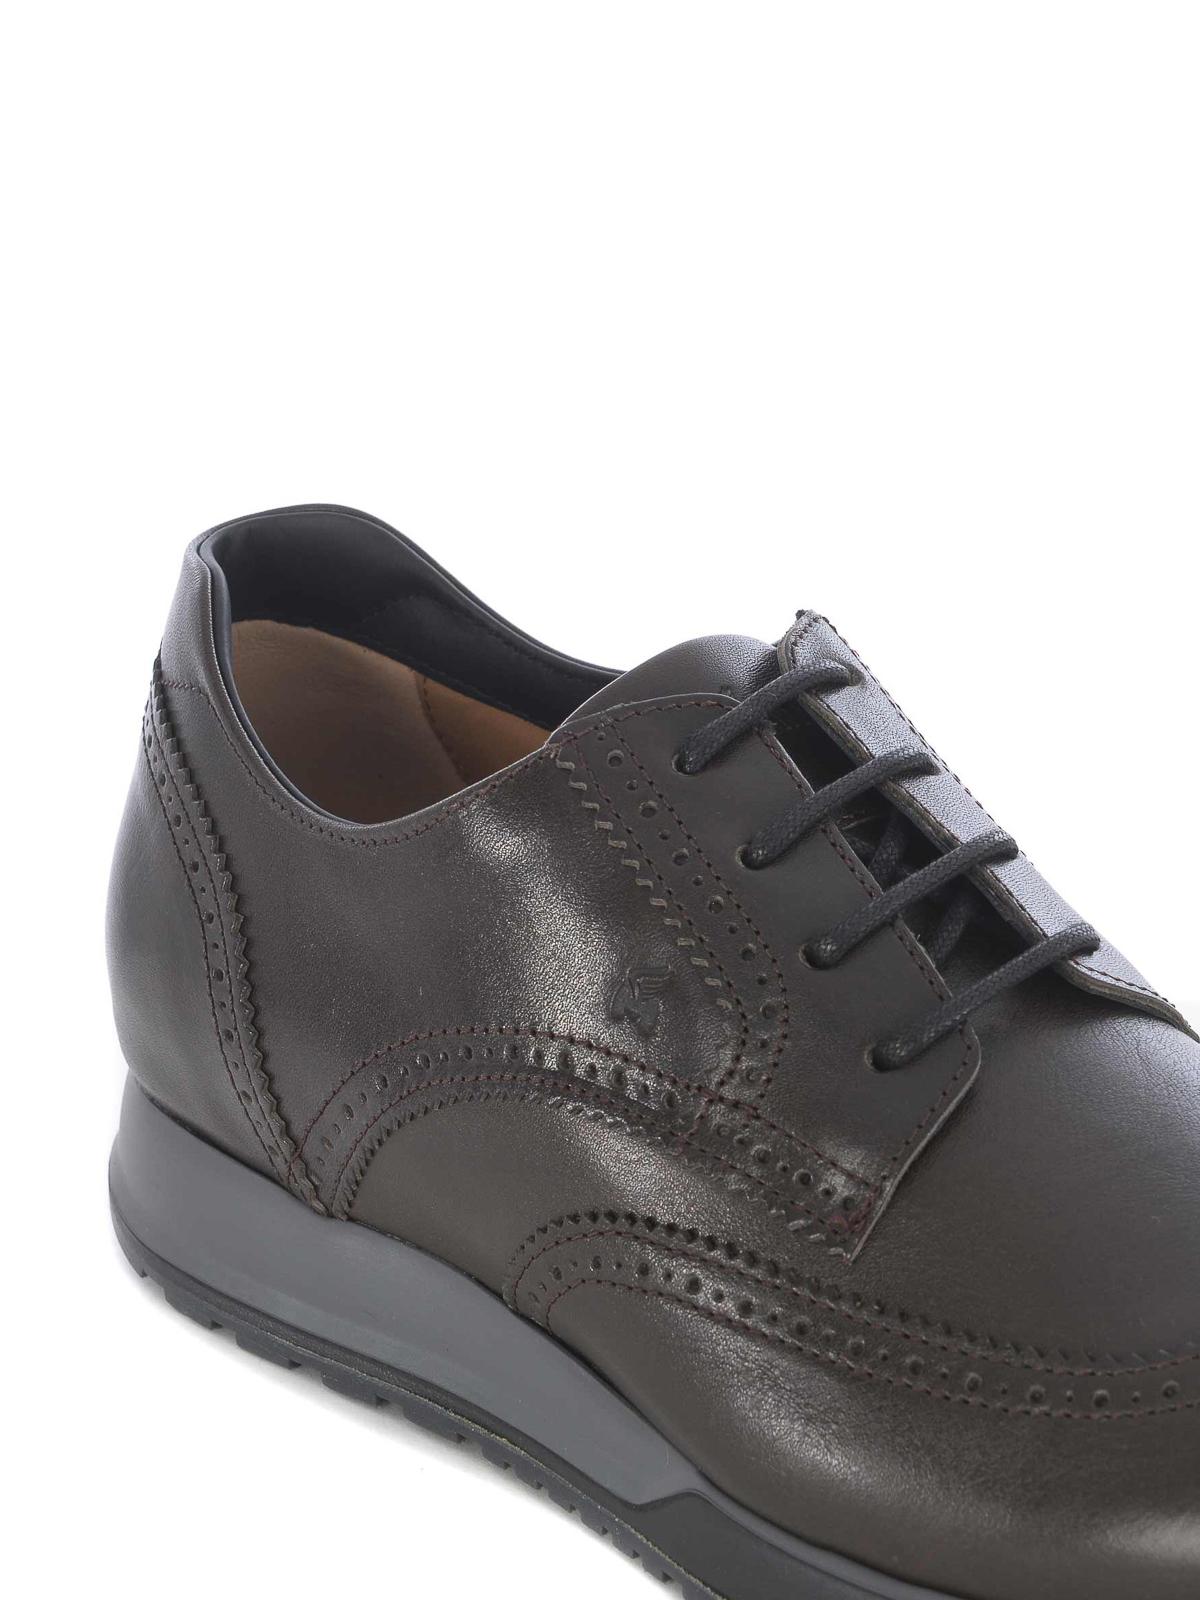 Hogan - H321 Derby brogue sneakers